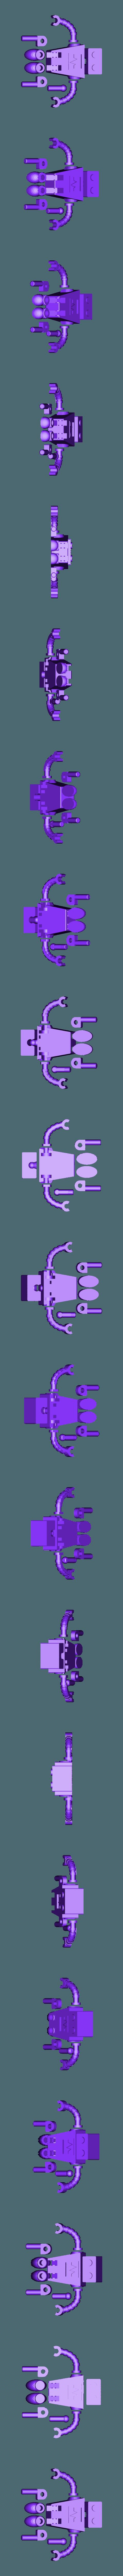 papa.stl Download free STL file Robot Family Simple No Support • 3D printable design, Toymakr3D